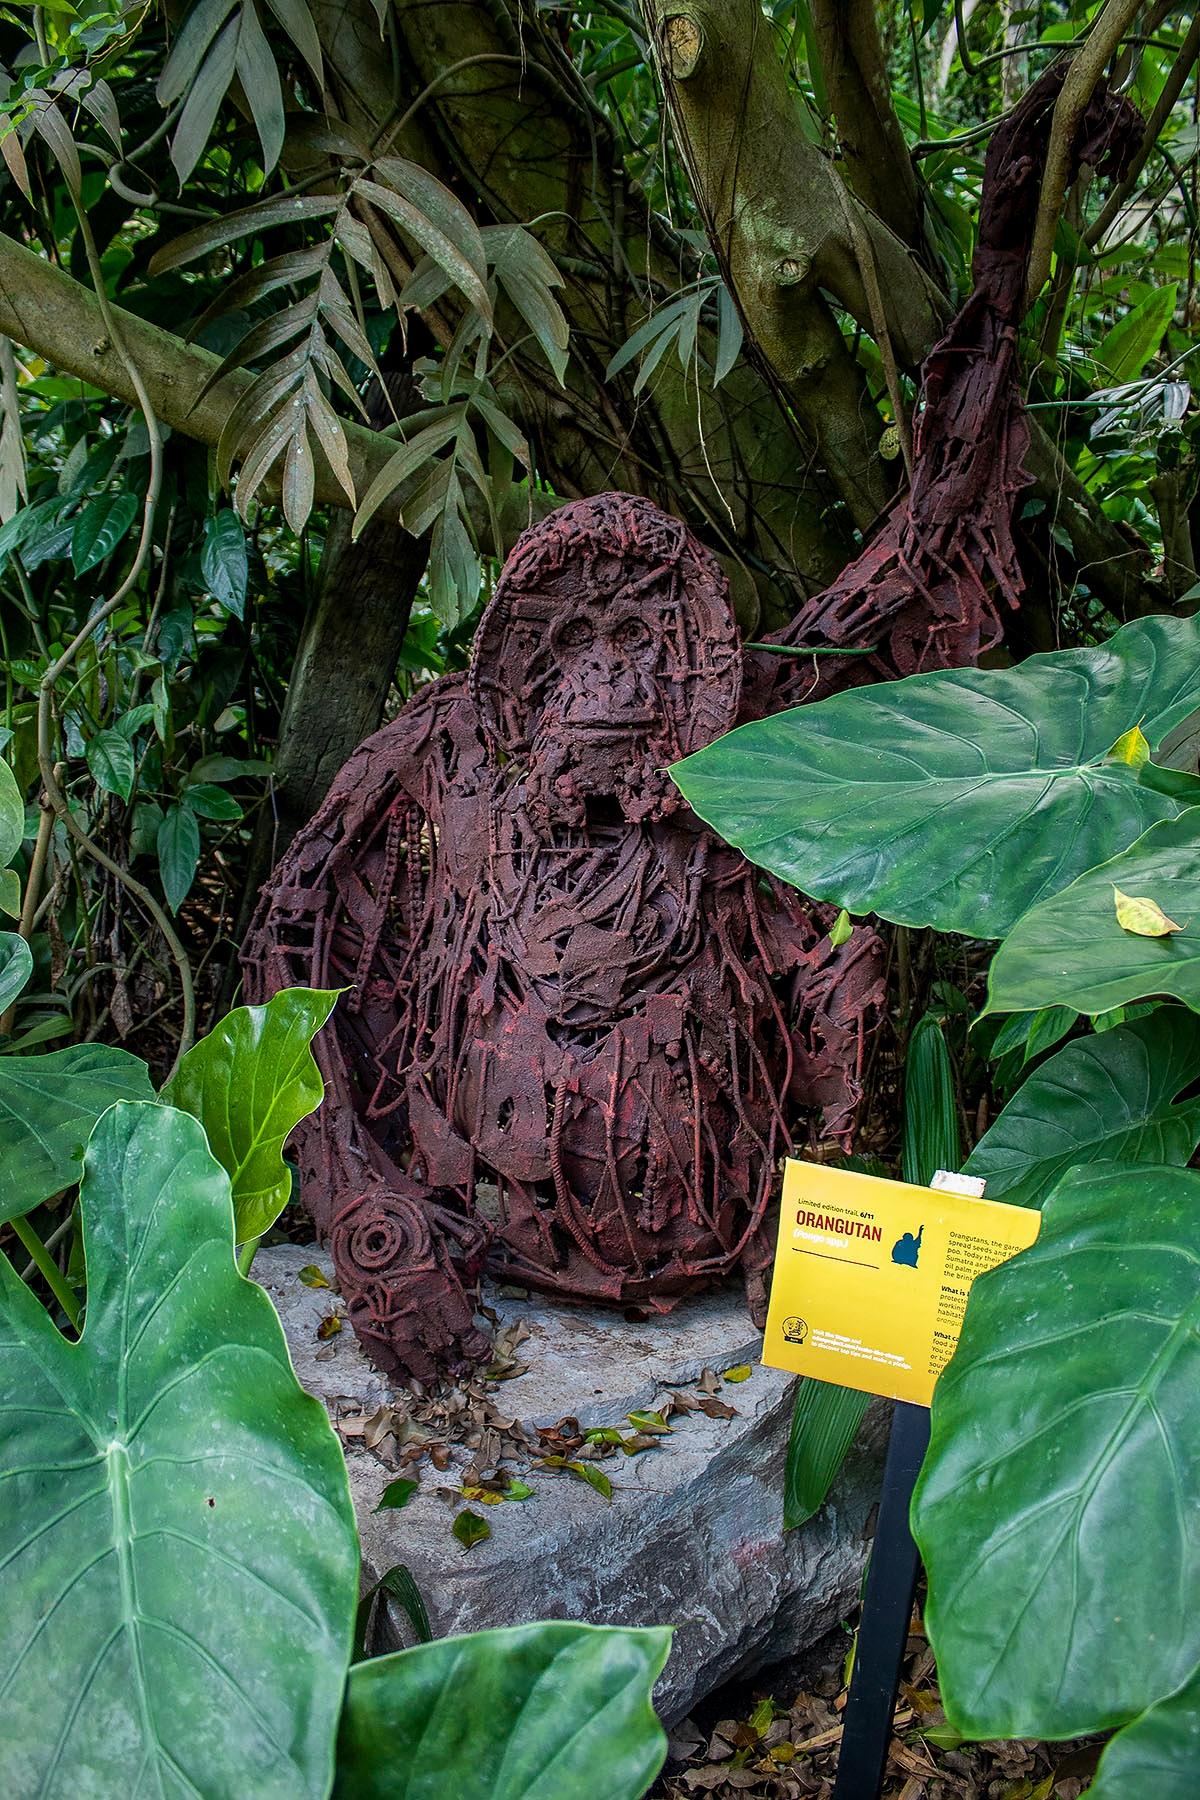 A metal sculpture of an orangutan hiding in the Rainforest biome at The Eden Project